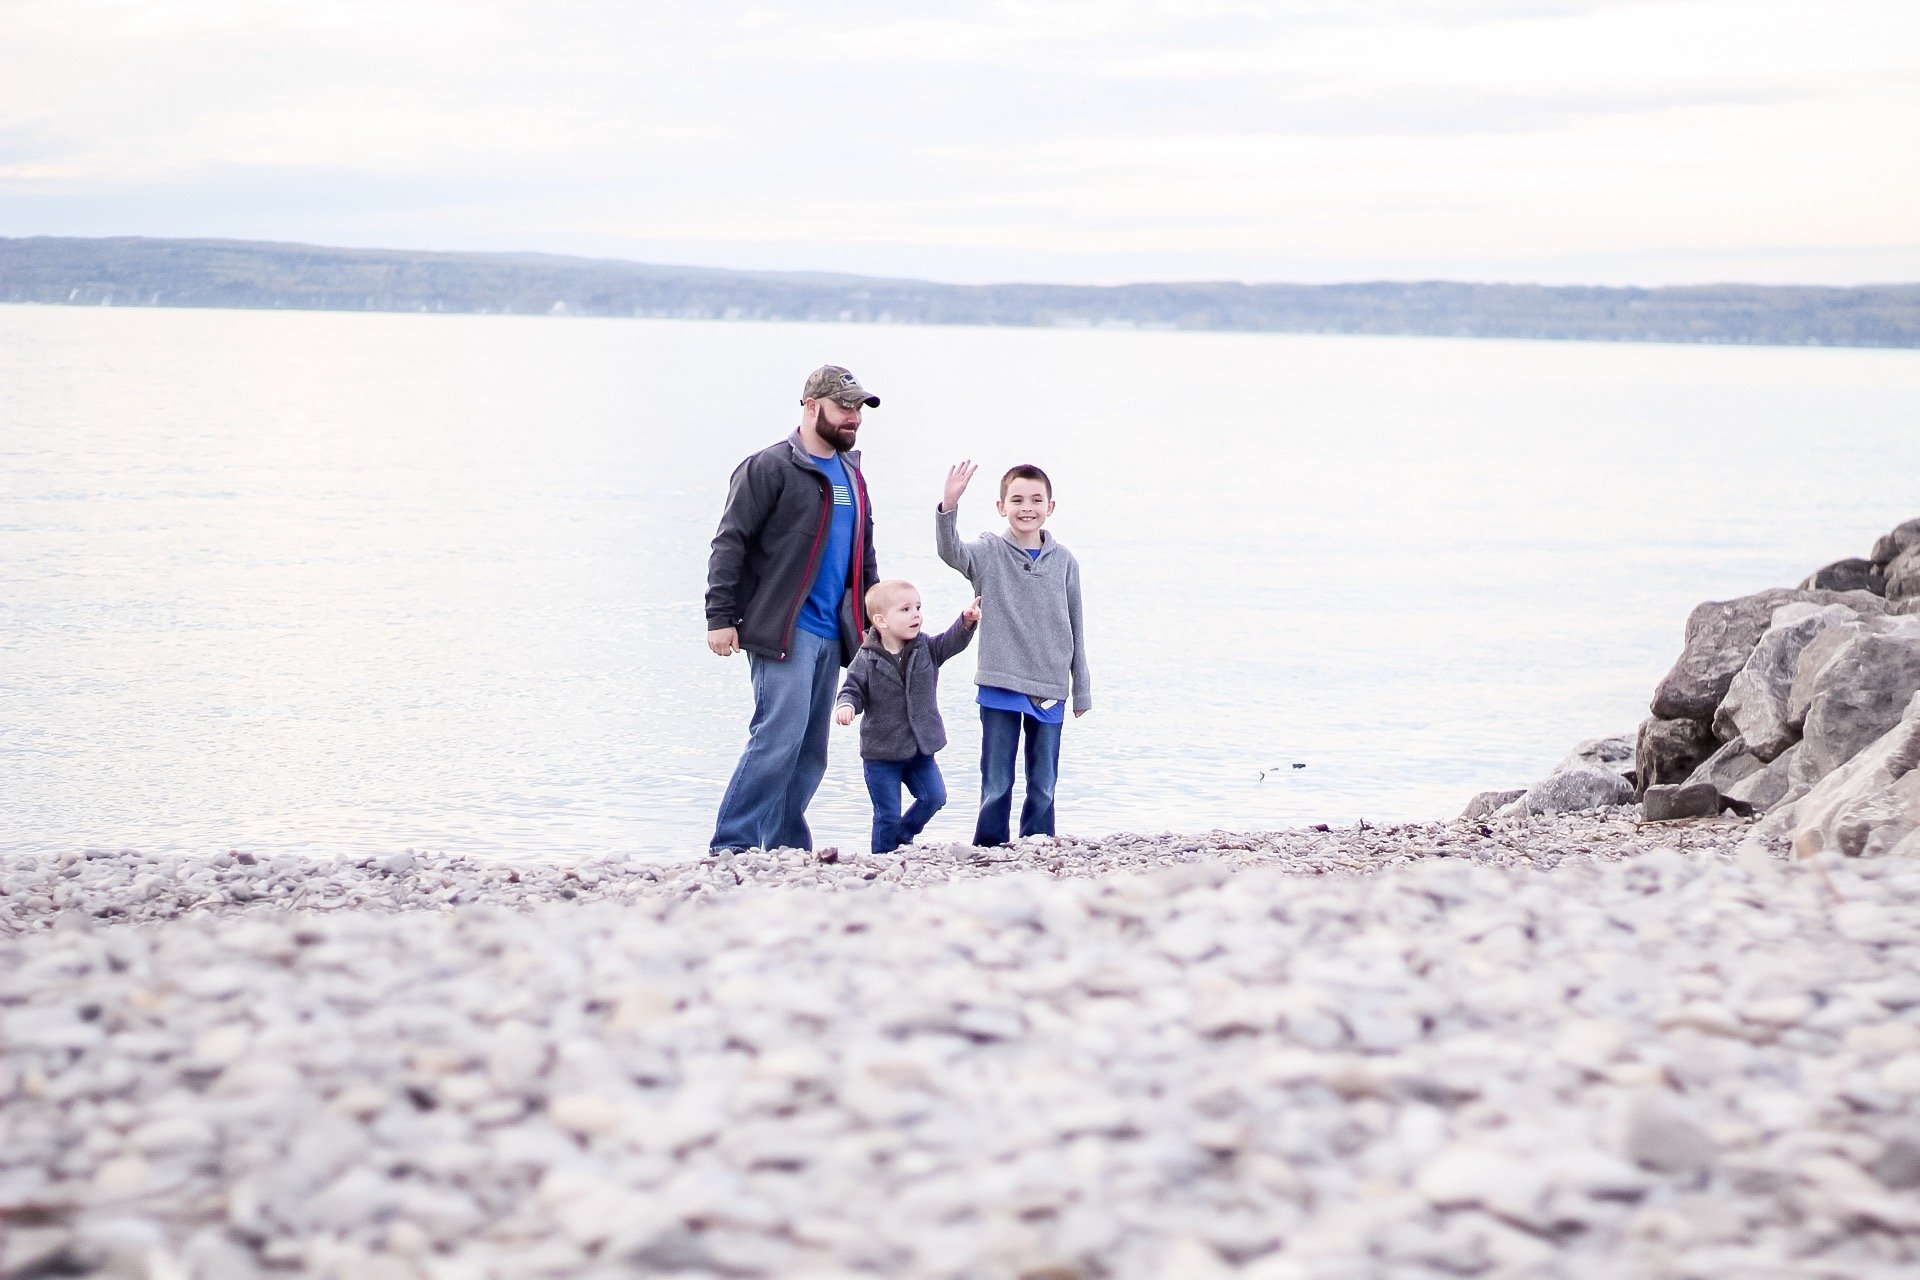 petoskey mi boys on beach